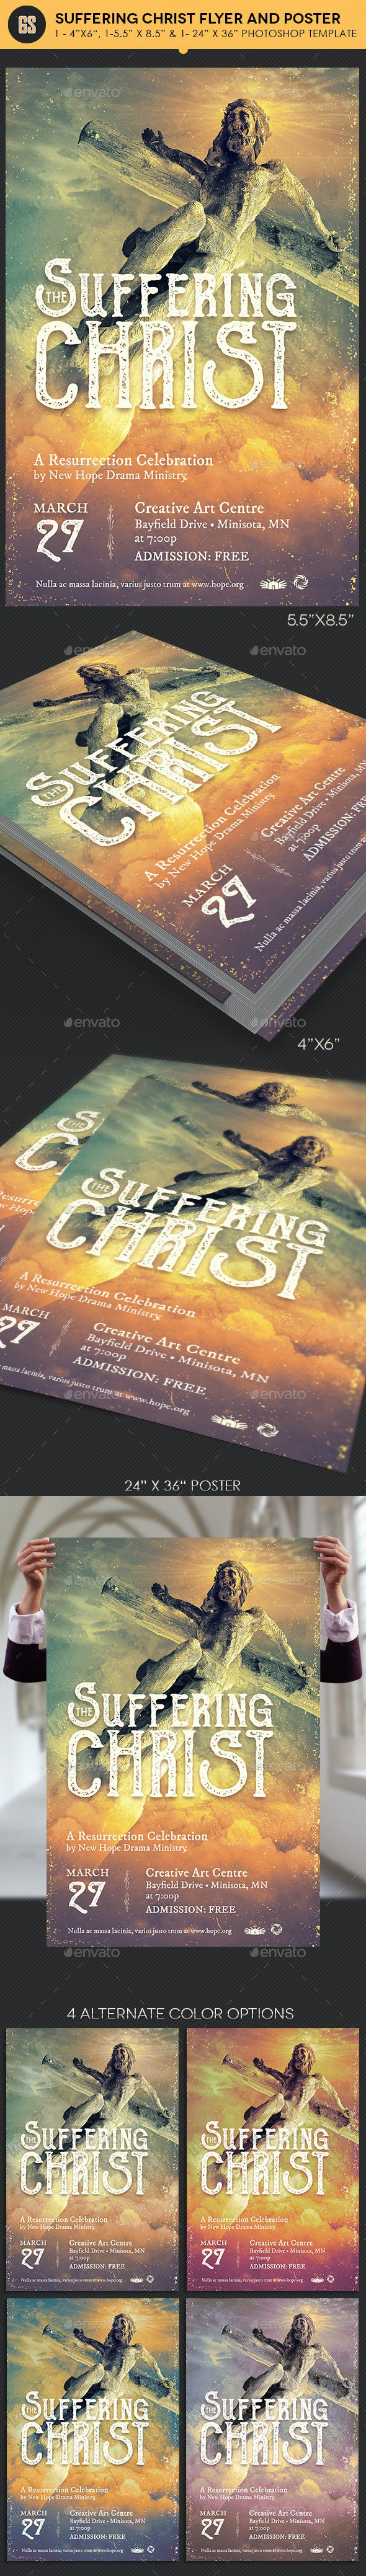 Suffering Christ Flyer Poster Template - Church Flyers